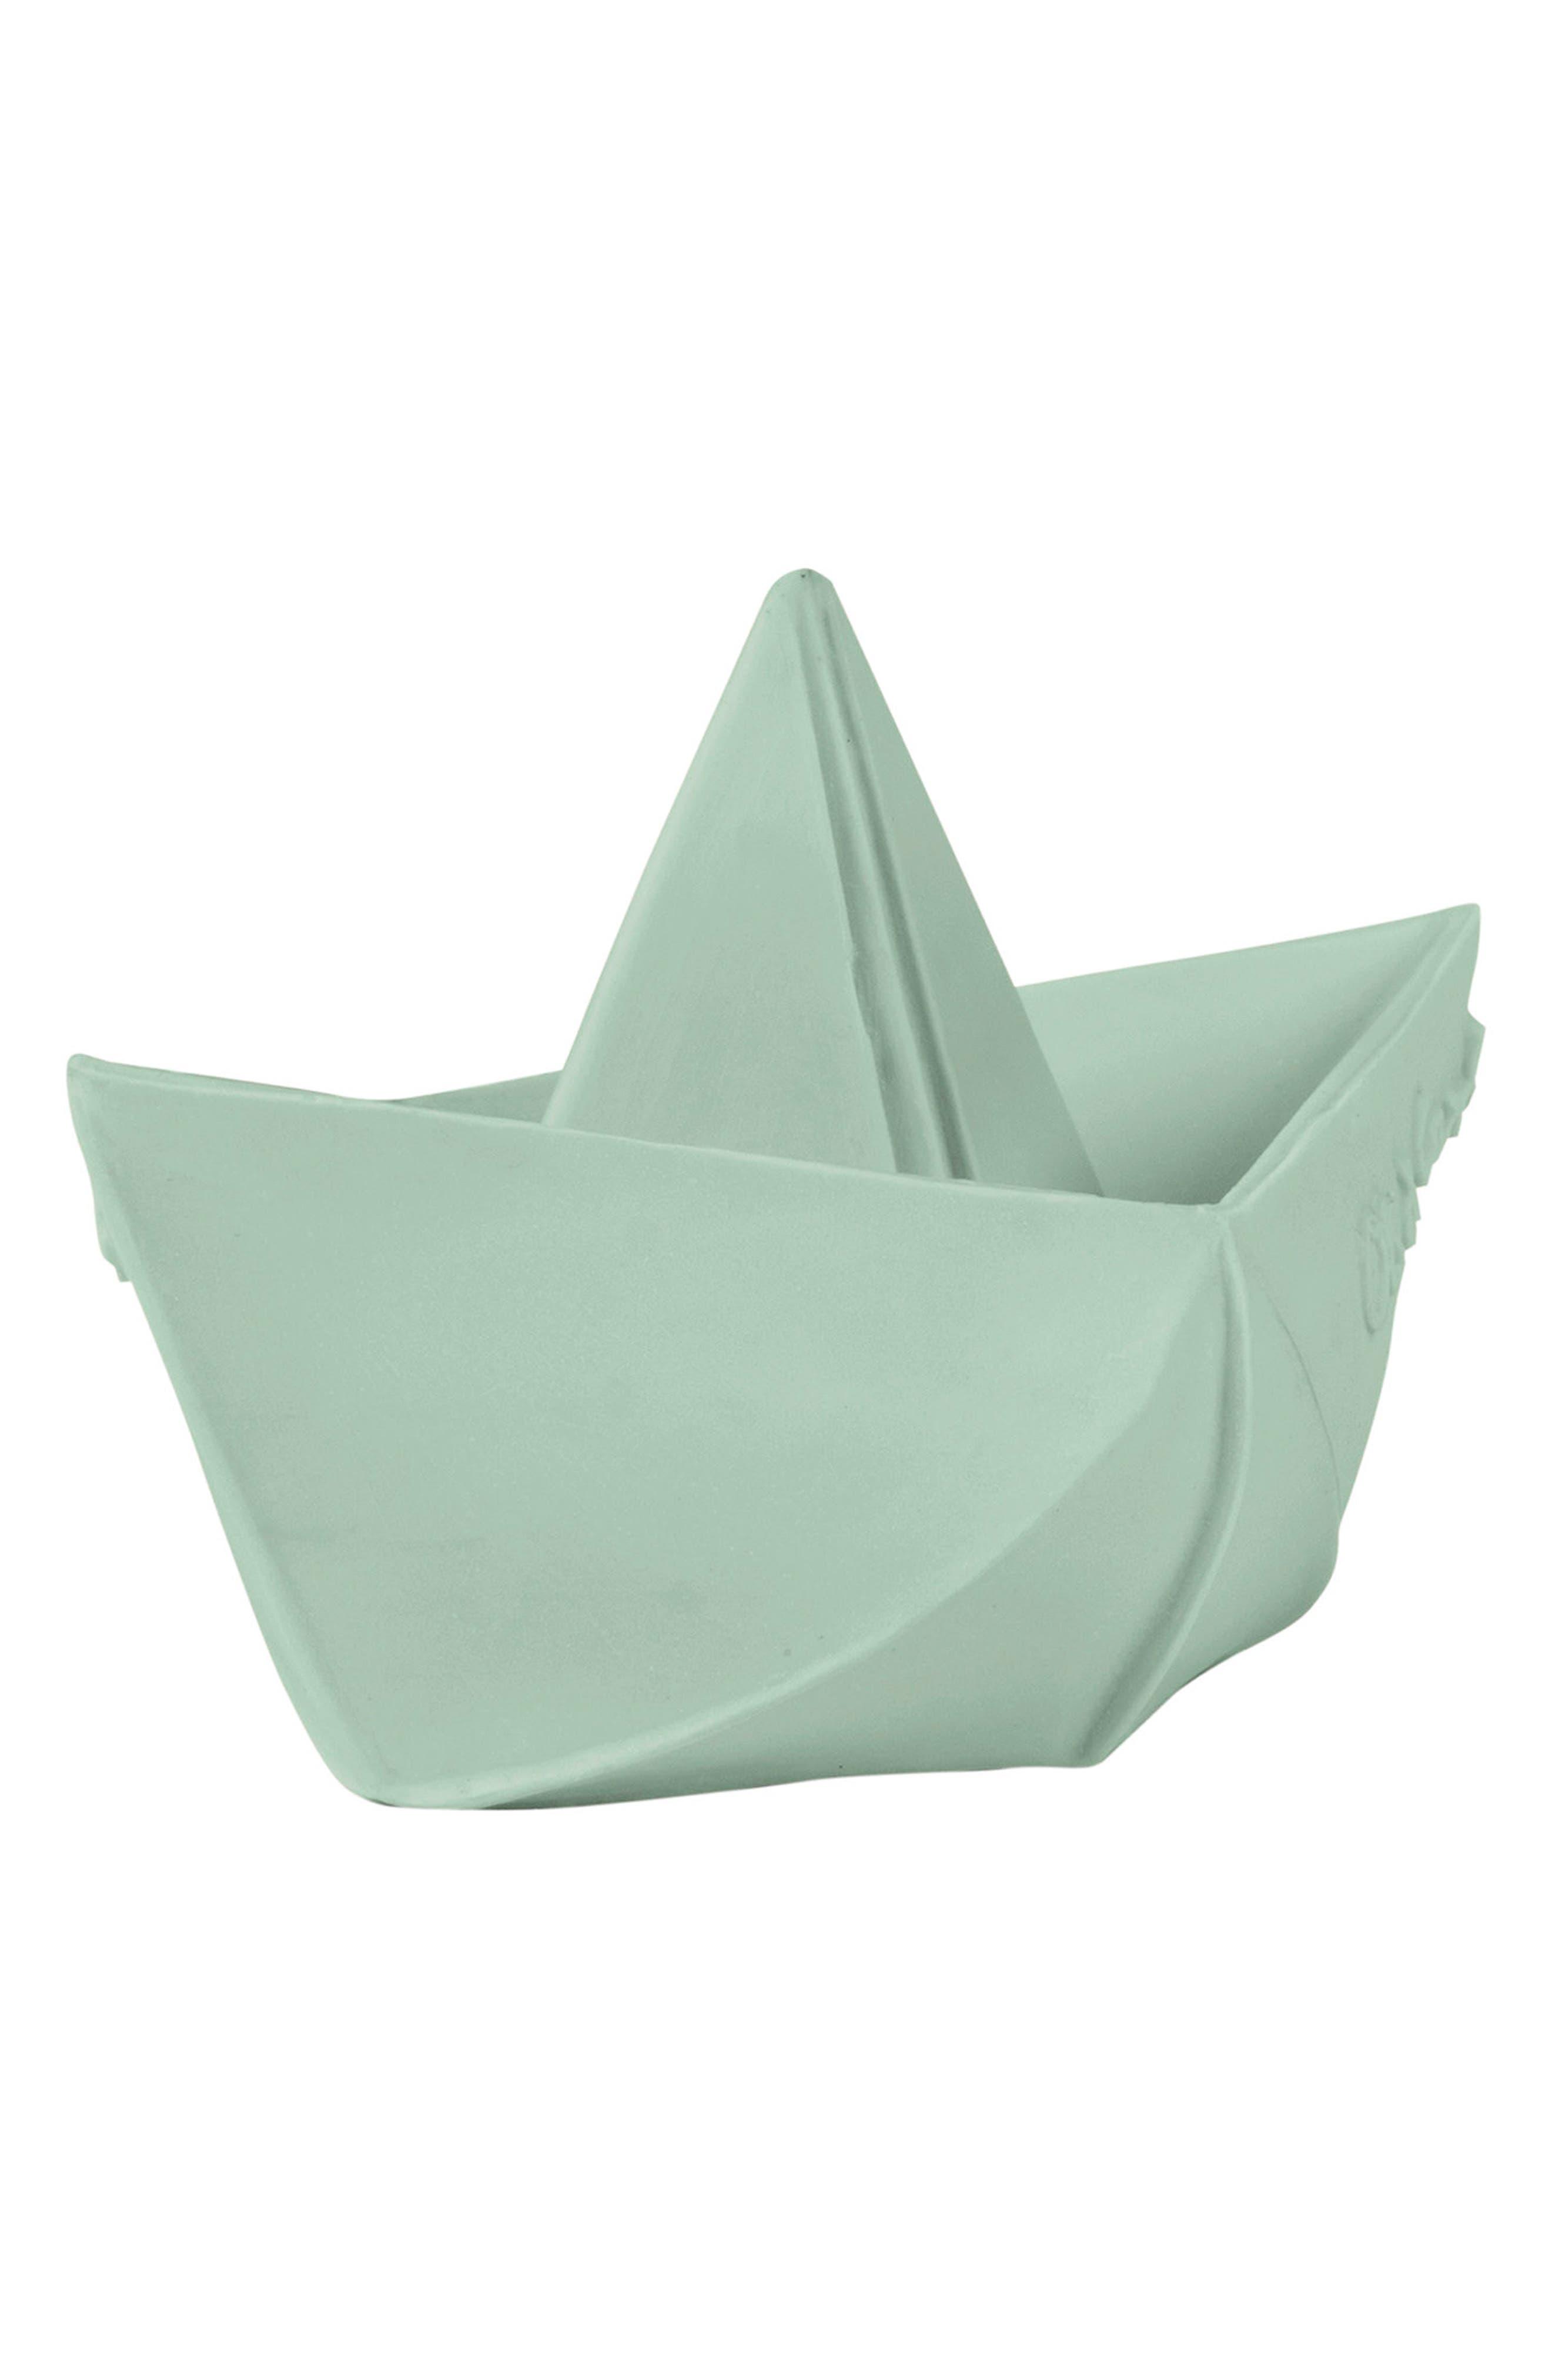 Main Image - Oli & Carol Origami Boat Bath Toy